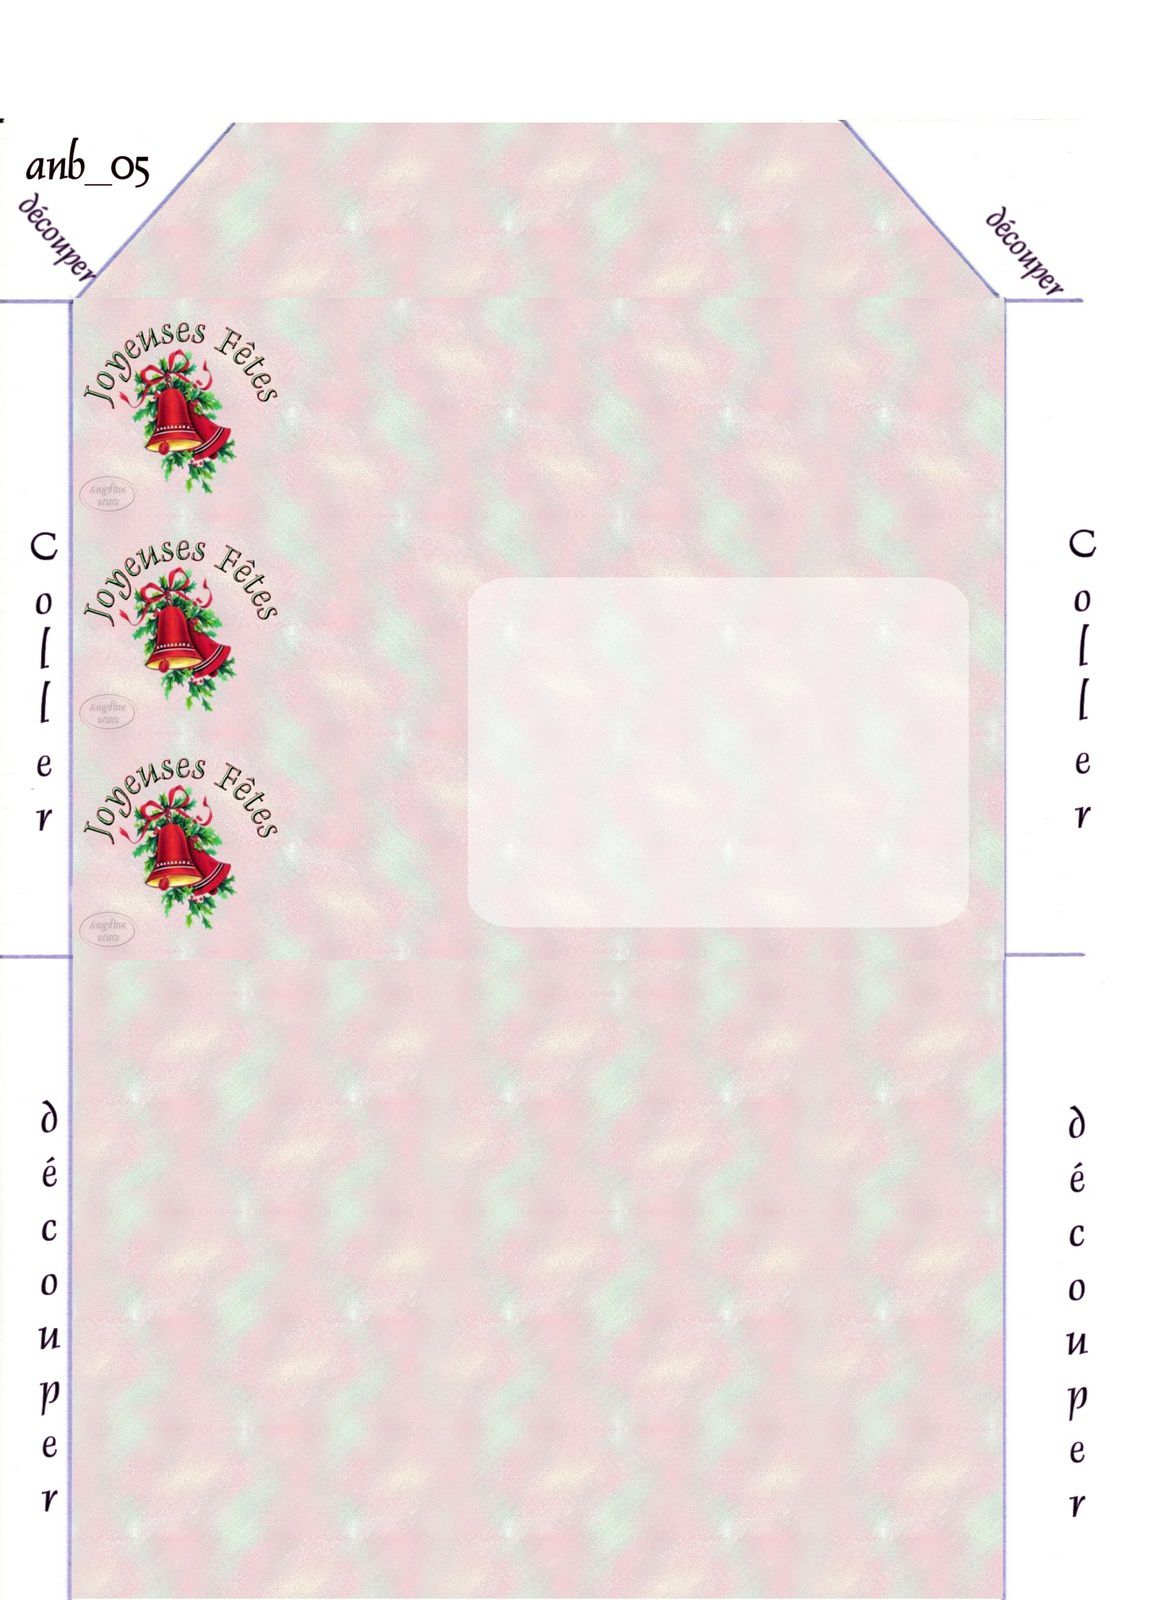 Joyeuses Fêtes Cloches IM &amp&#x3B; Papier A4 h l &amp&#x3B; outlook gif animé &amp&#x3B; enveloppe &amp&#x3B; 2 cartes A5 &amp&#x3B; signets joyeuses_fetes_cloches_1myh7uci_00